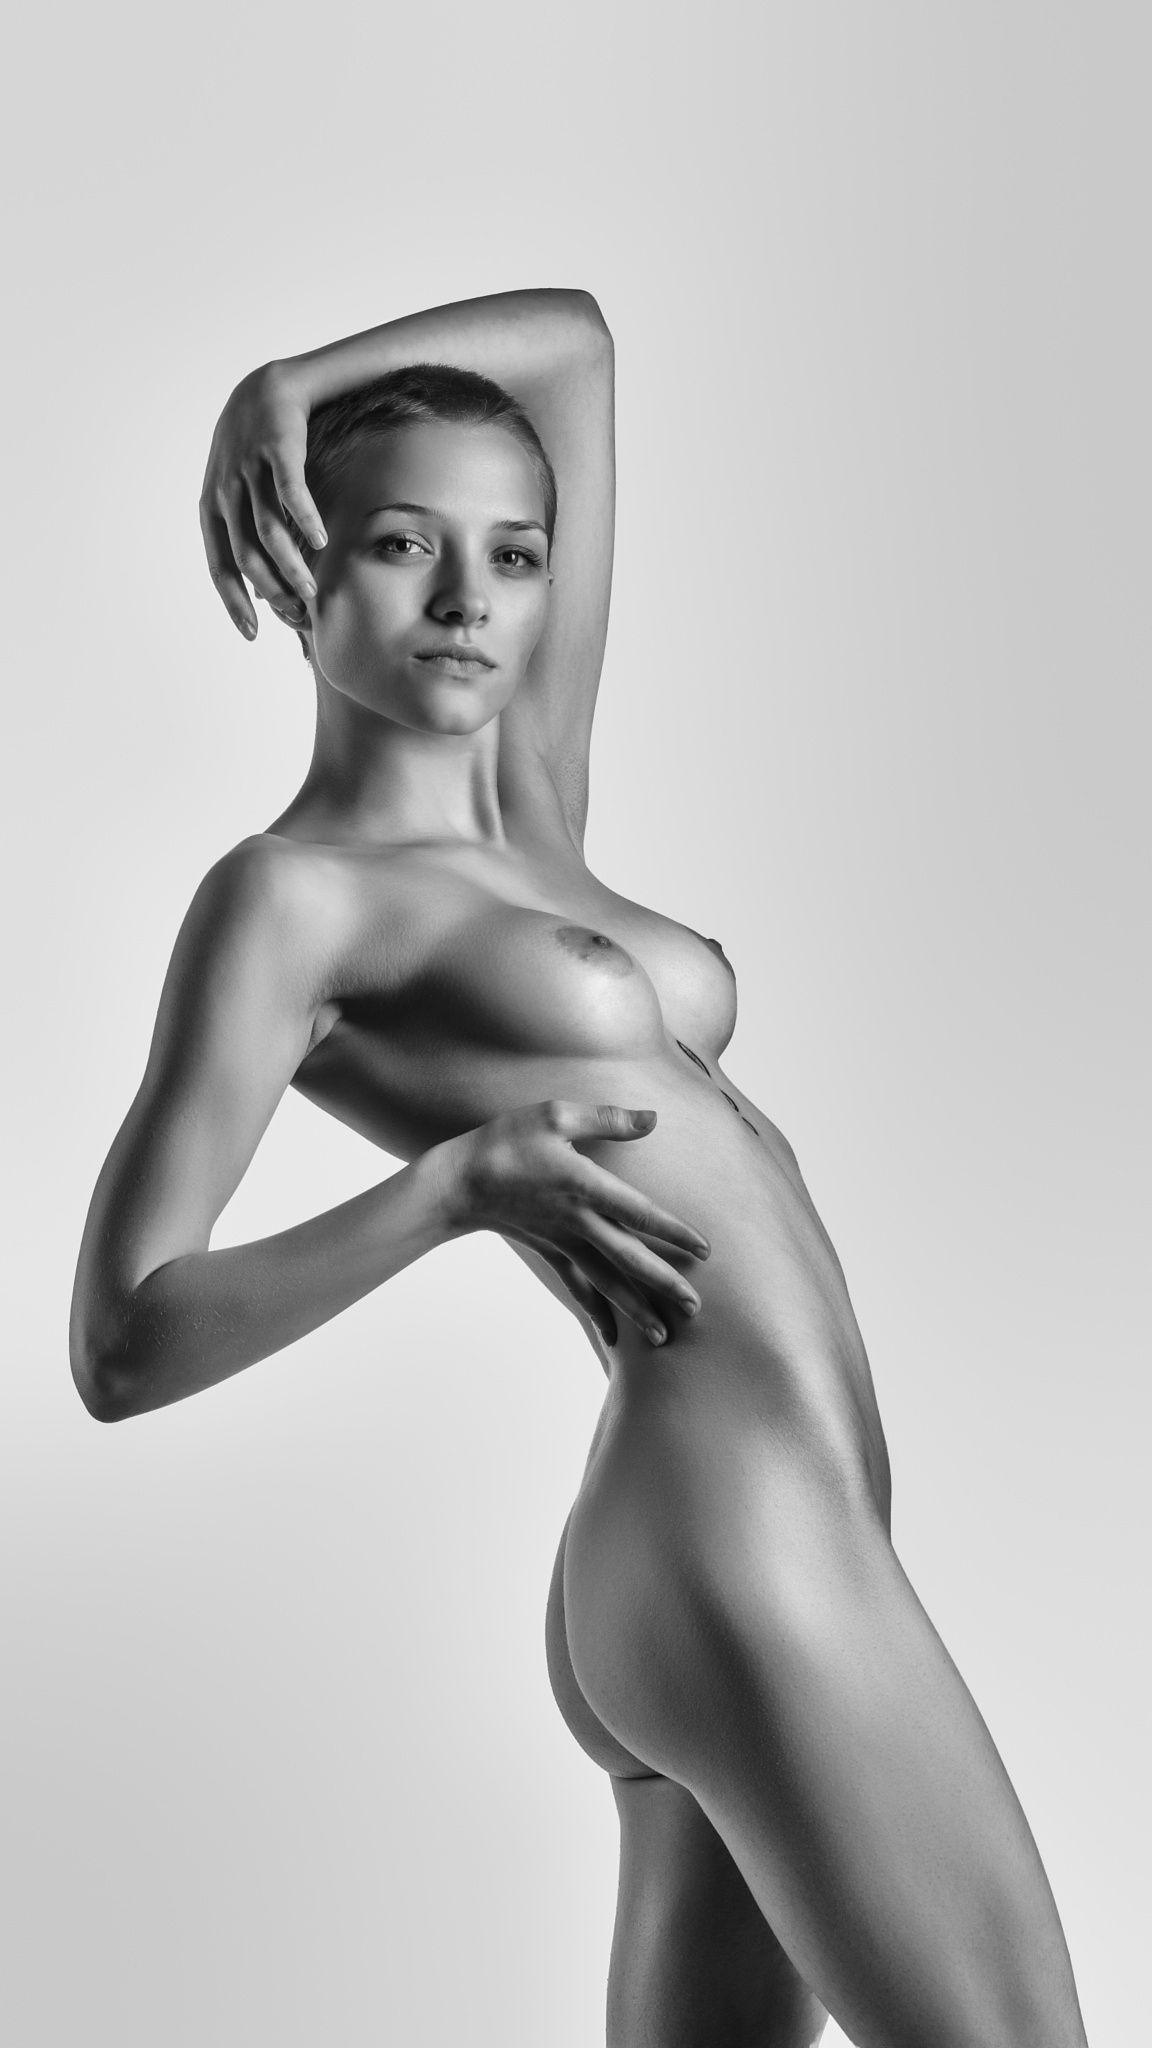 Black girl sexting nude